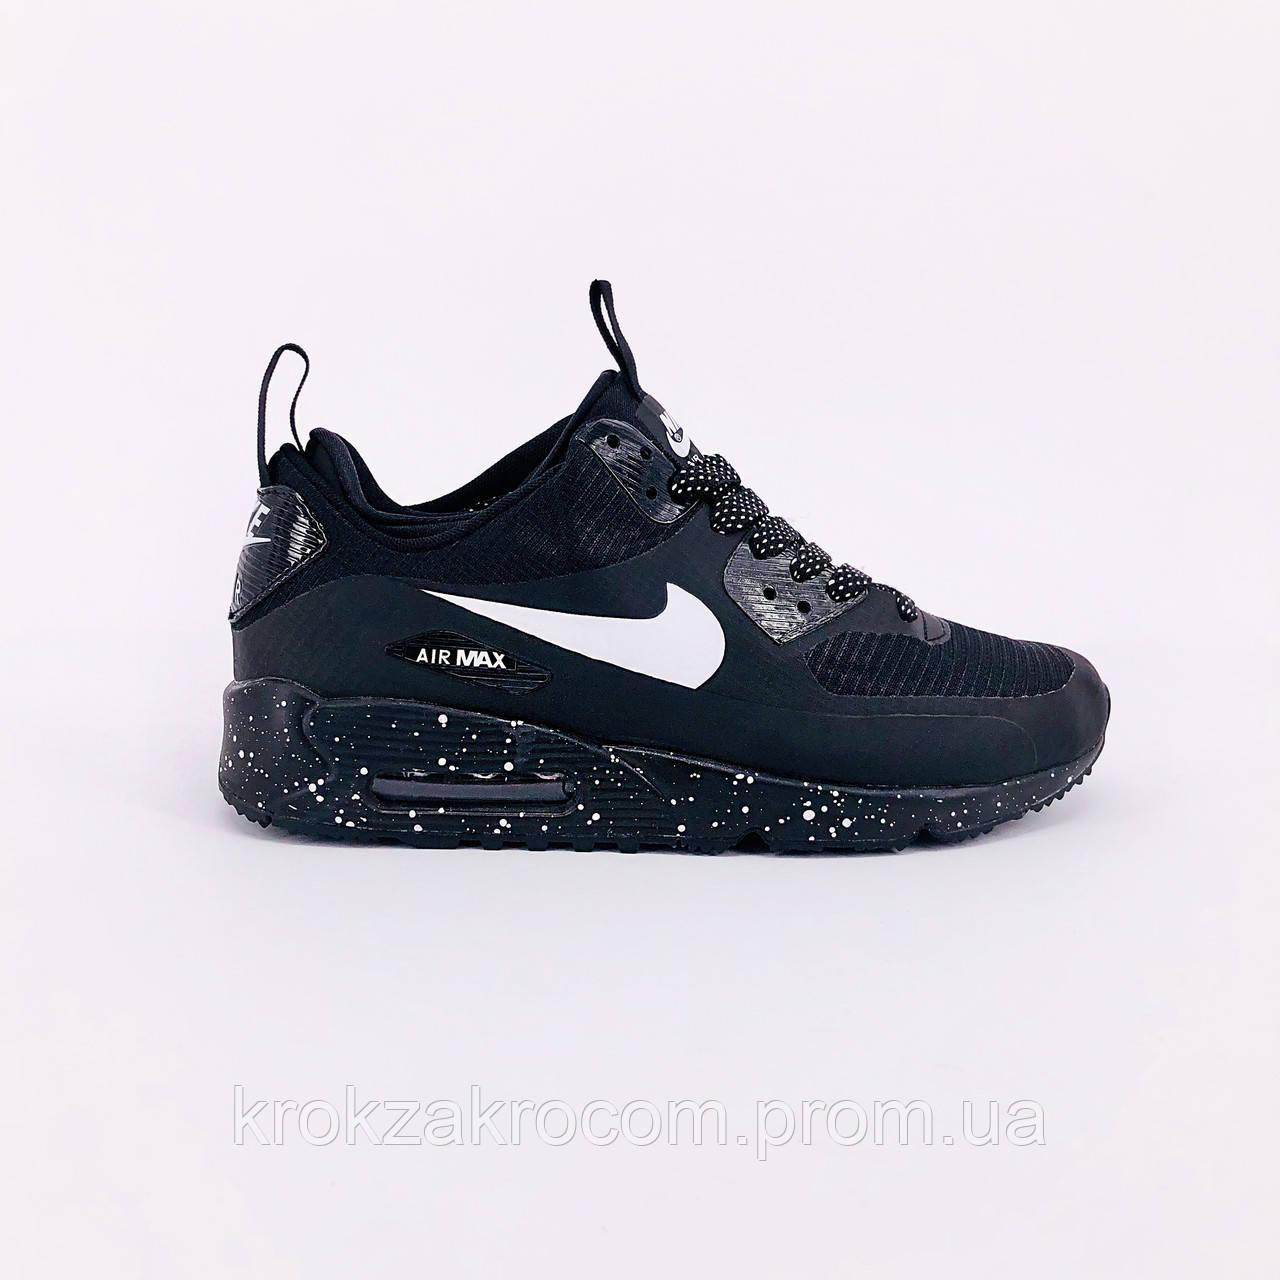 3c46731e Кроссовки Nike Air Max 90 Mid Winter Replica AAA 41-26 См — в ...